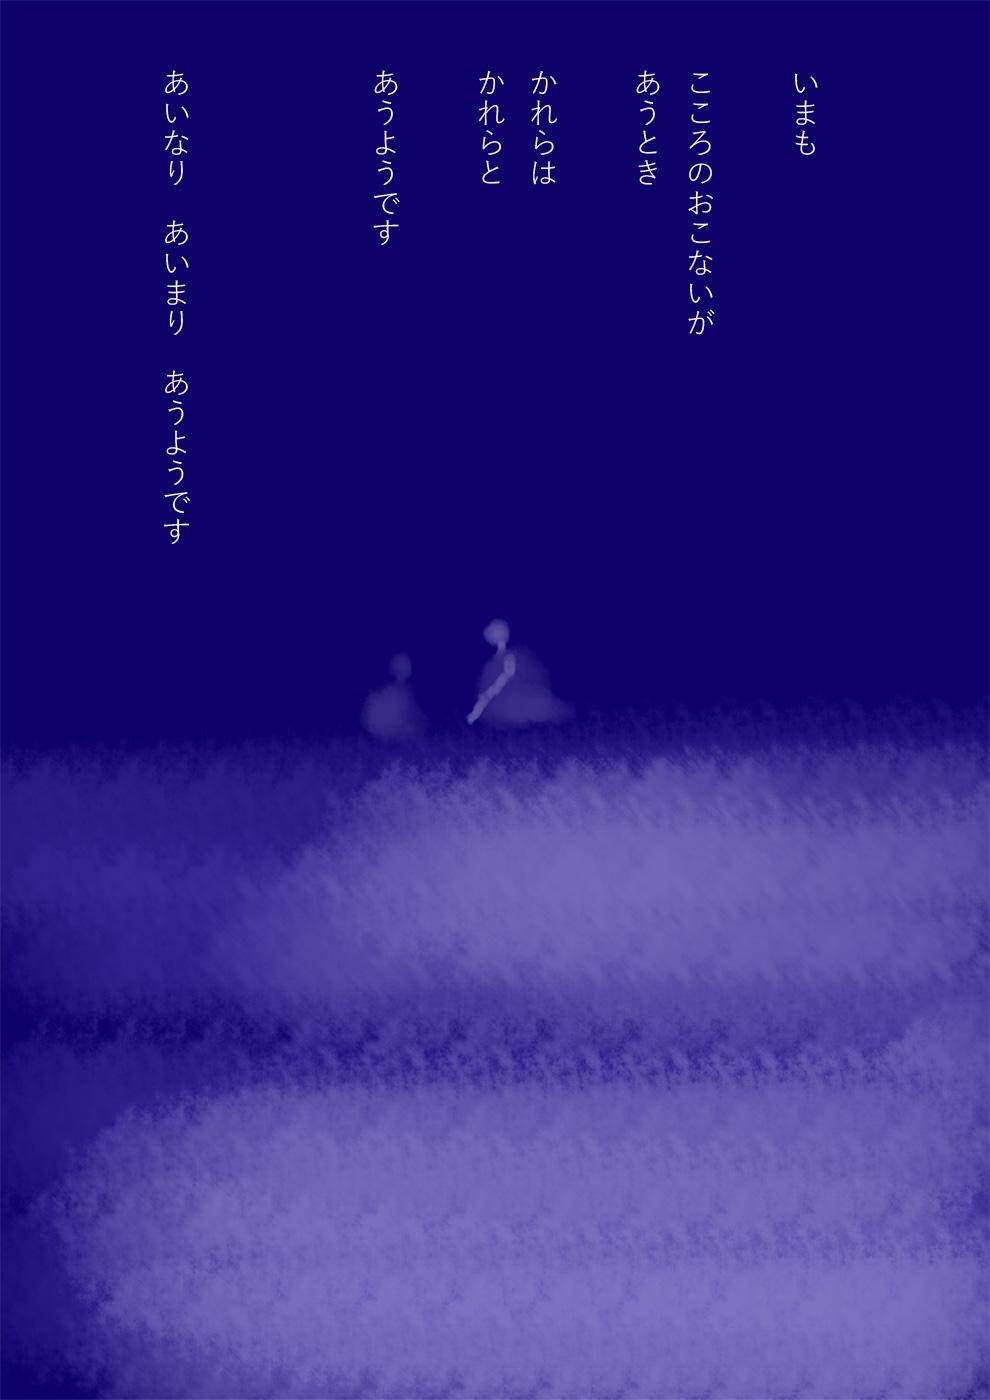 http://ahito.com/comic/ehon/voice/img/2018/20180324/05.jpg